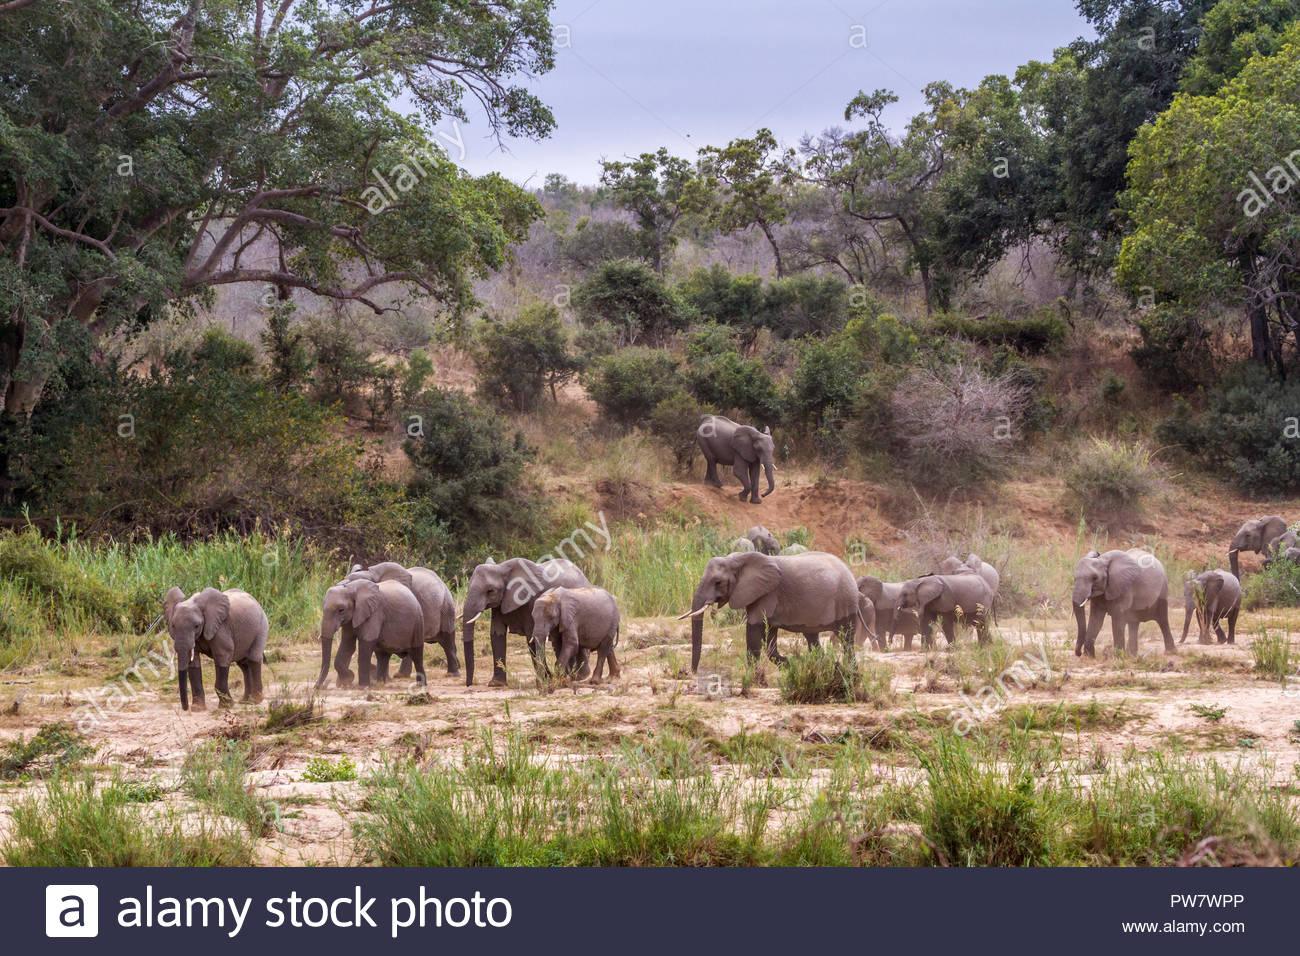 African bush elephant in Kruger National park, South Africa ; Specie Loxodonta africana family of Elephantidae - Stock Image